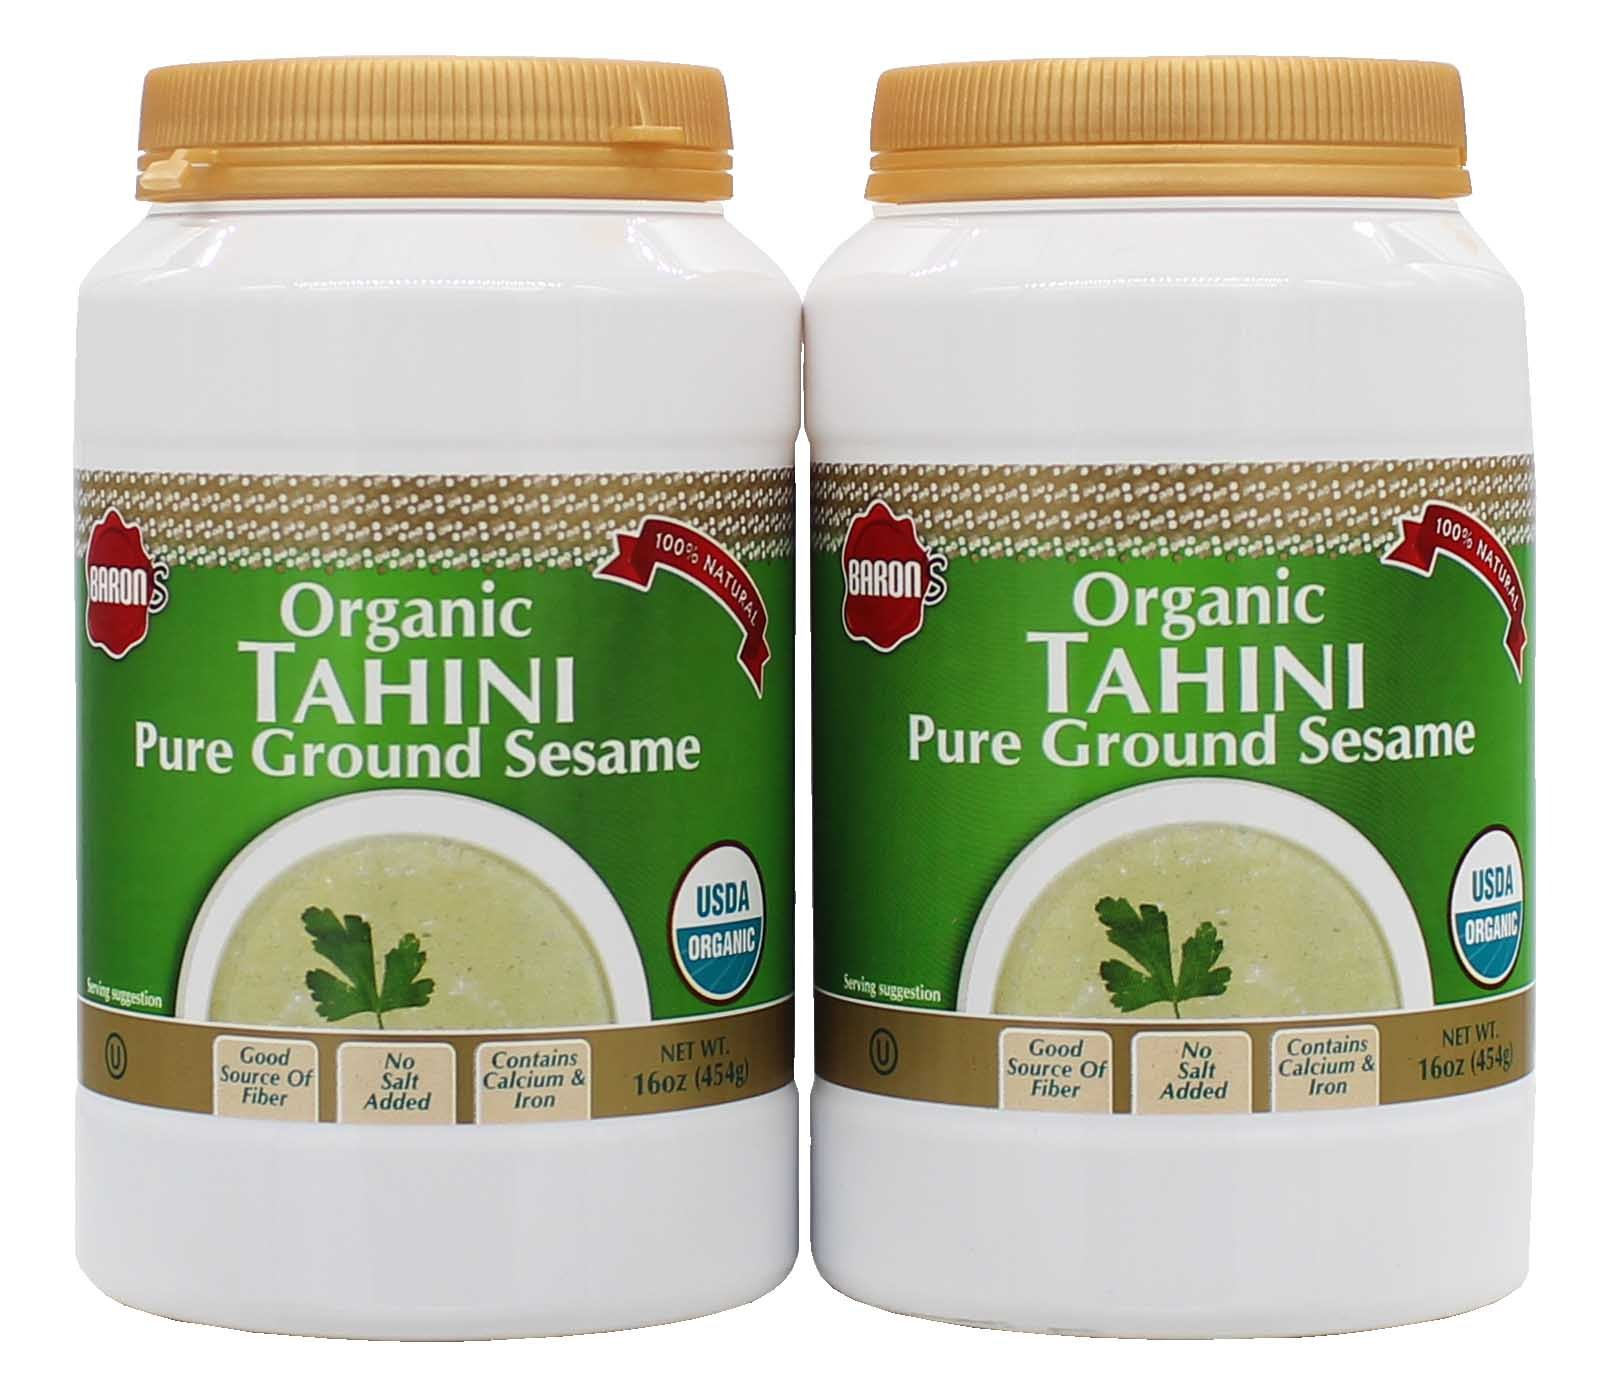 Baron's USDA Organic Tahini - Pure Ground Sesame Kosher 16-ounce Jars (Pack of 2) by Baron's (Image #1)